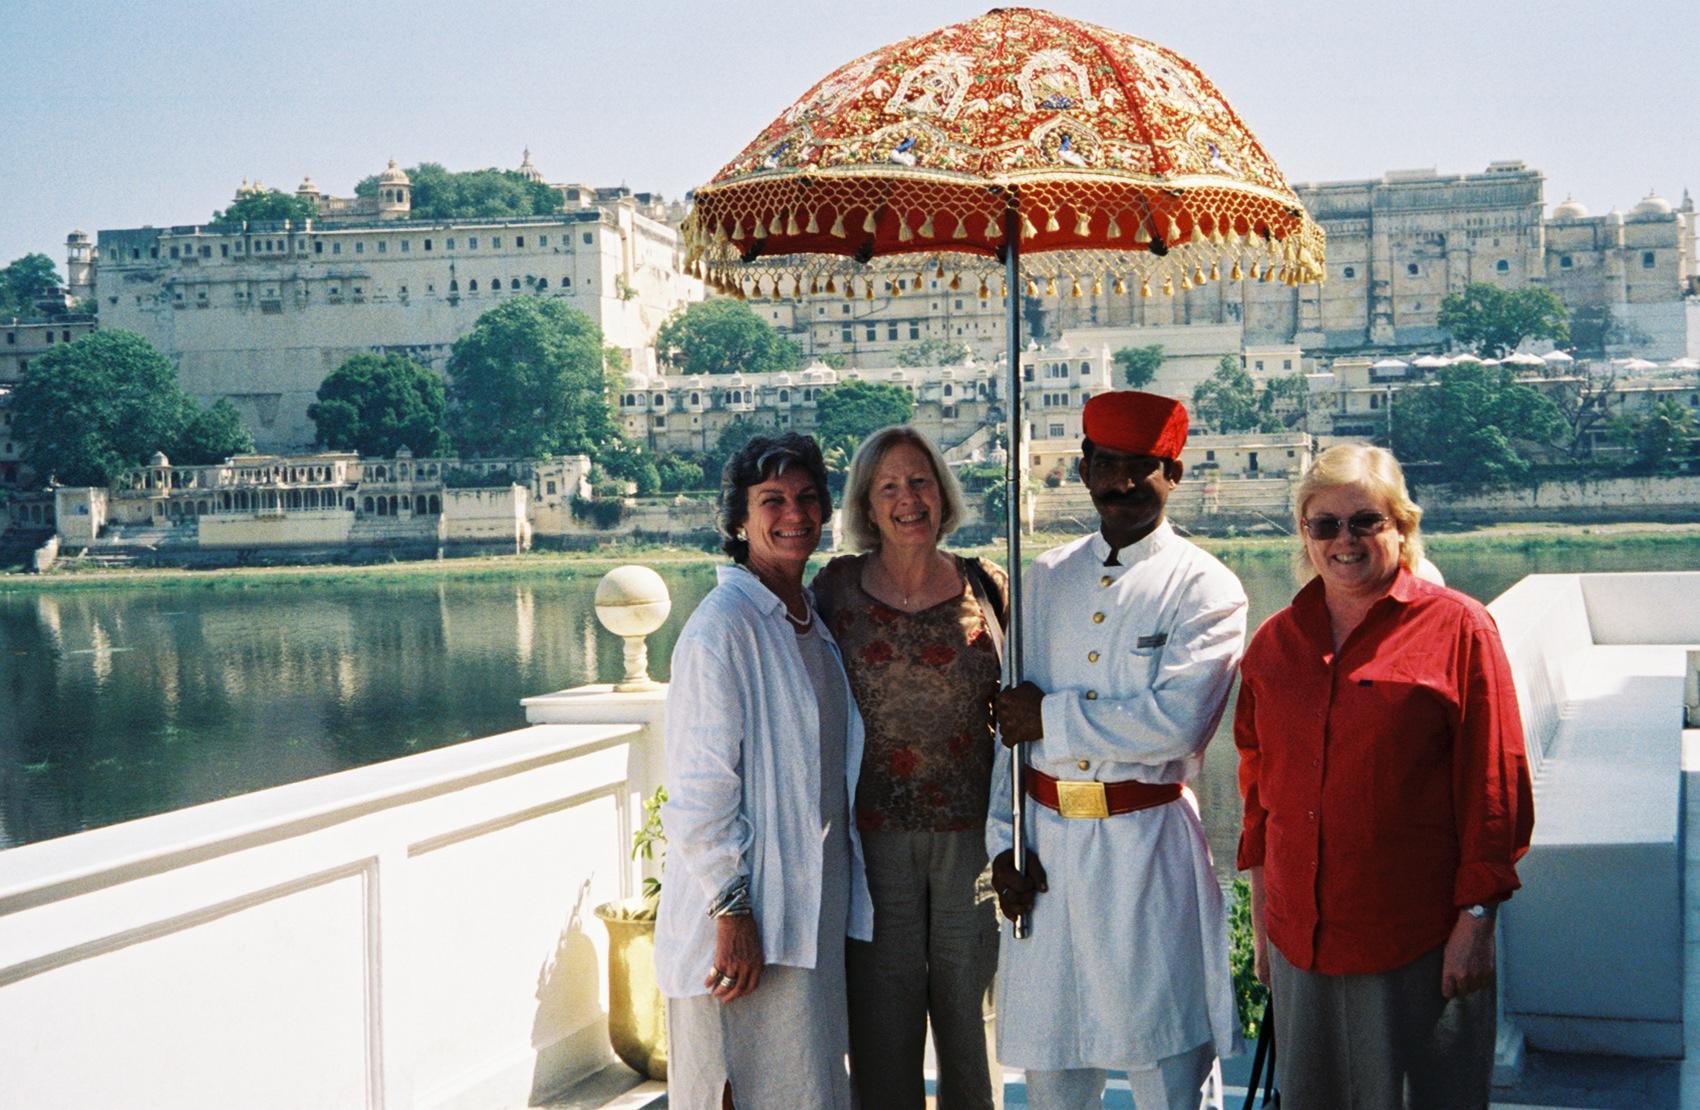 The Lake Palace, India